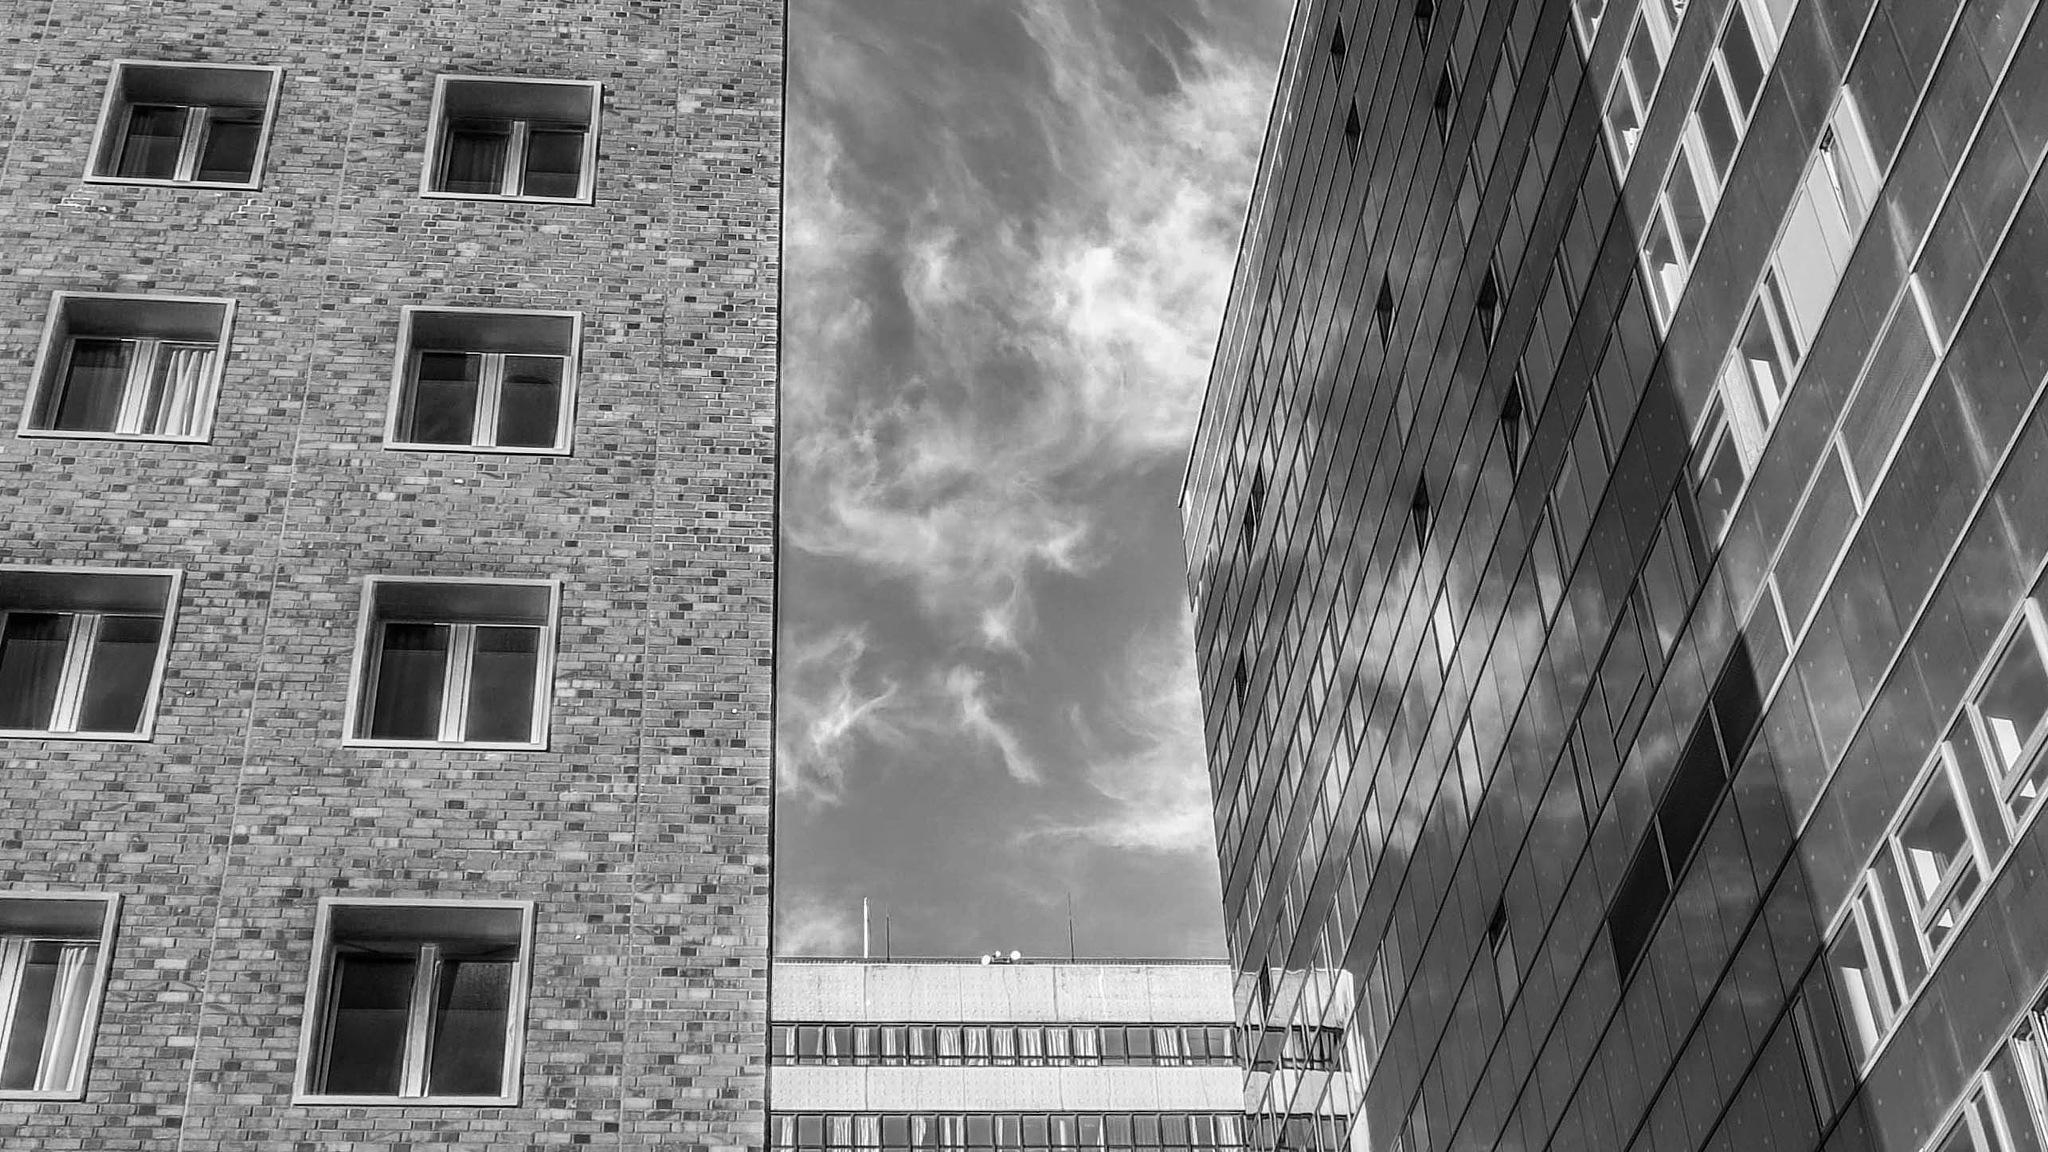 arrangement of three buildings /BW by Aaron Dannenberg